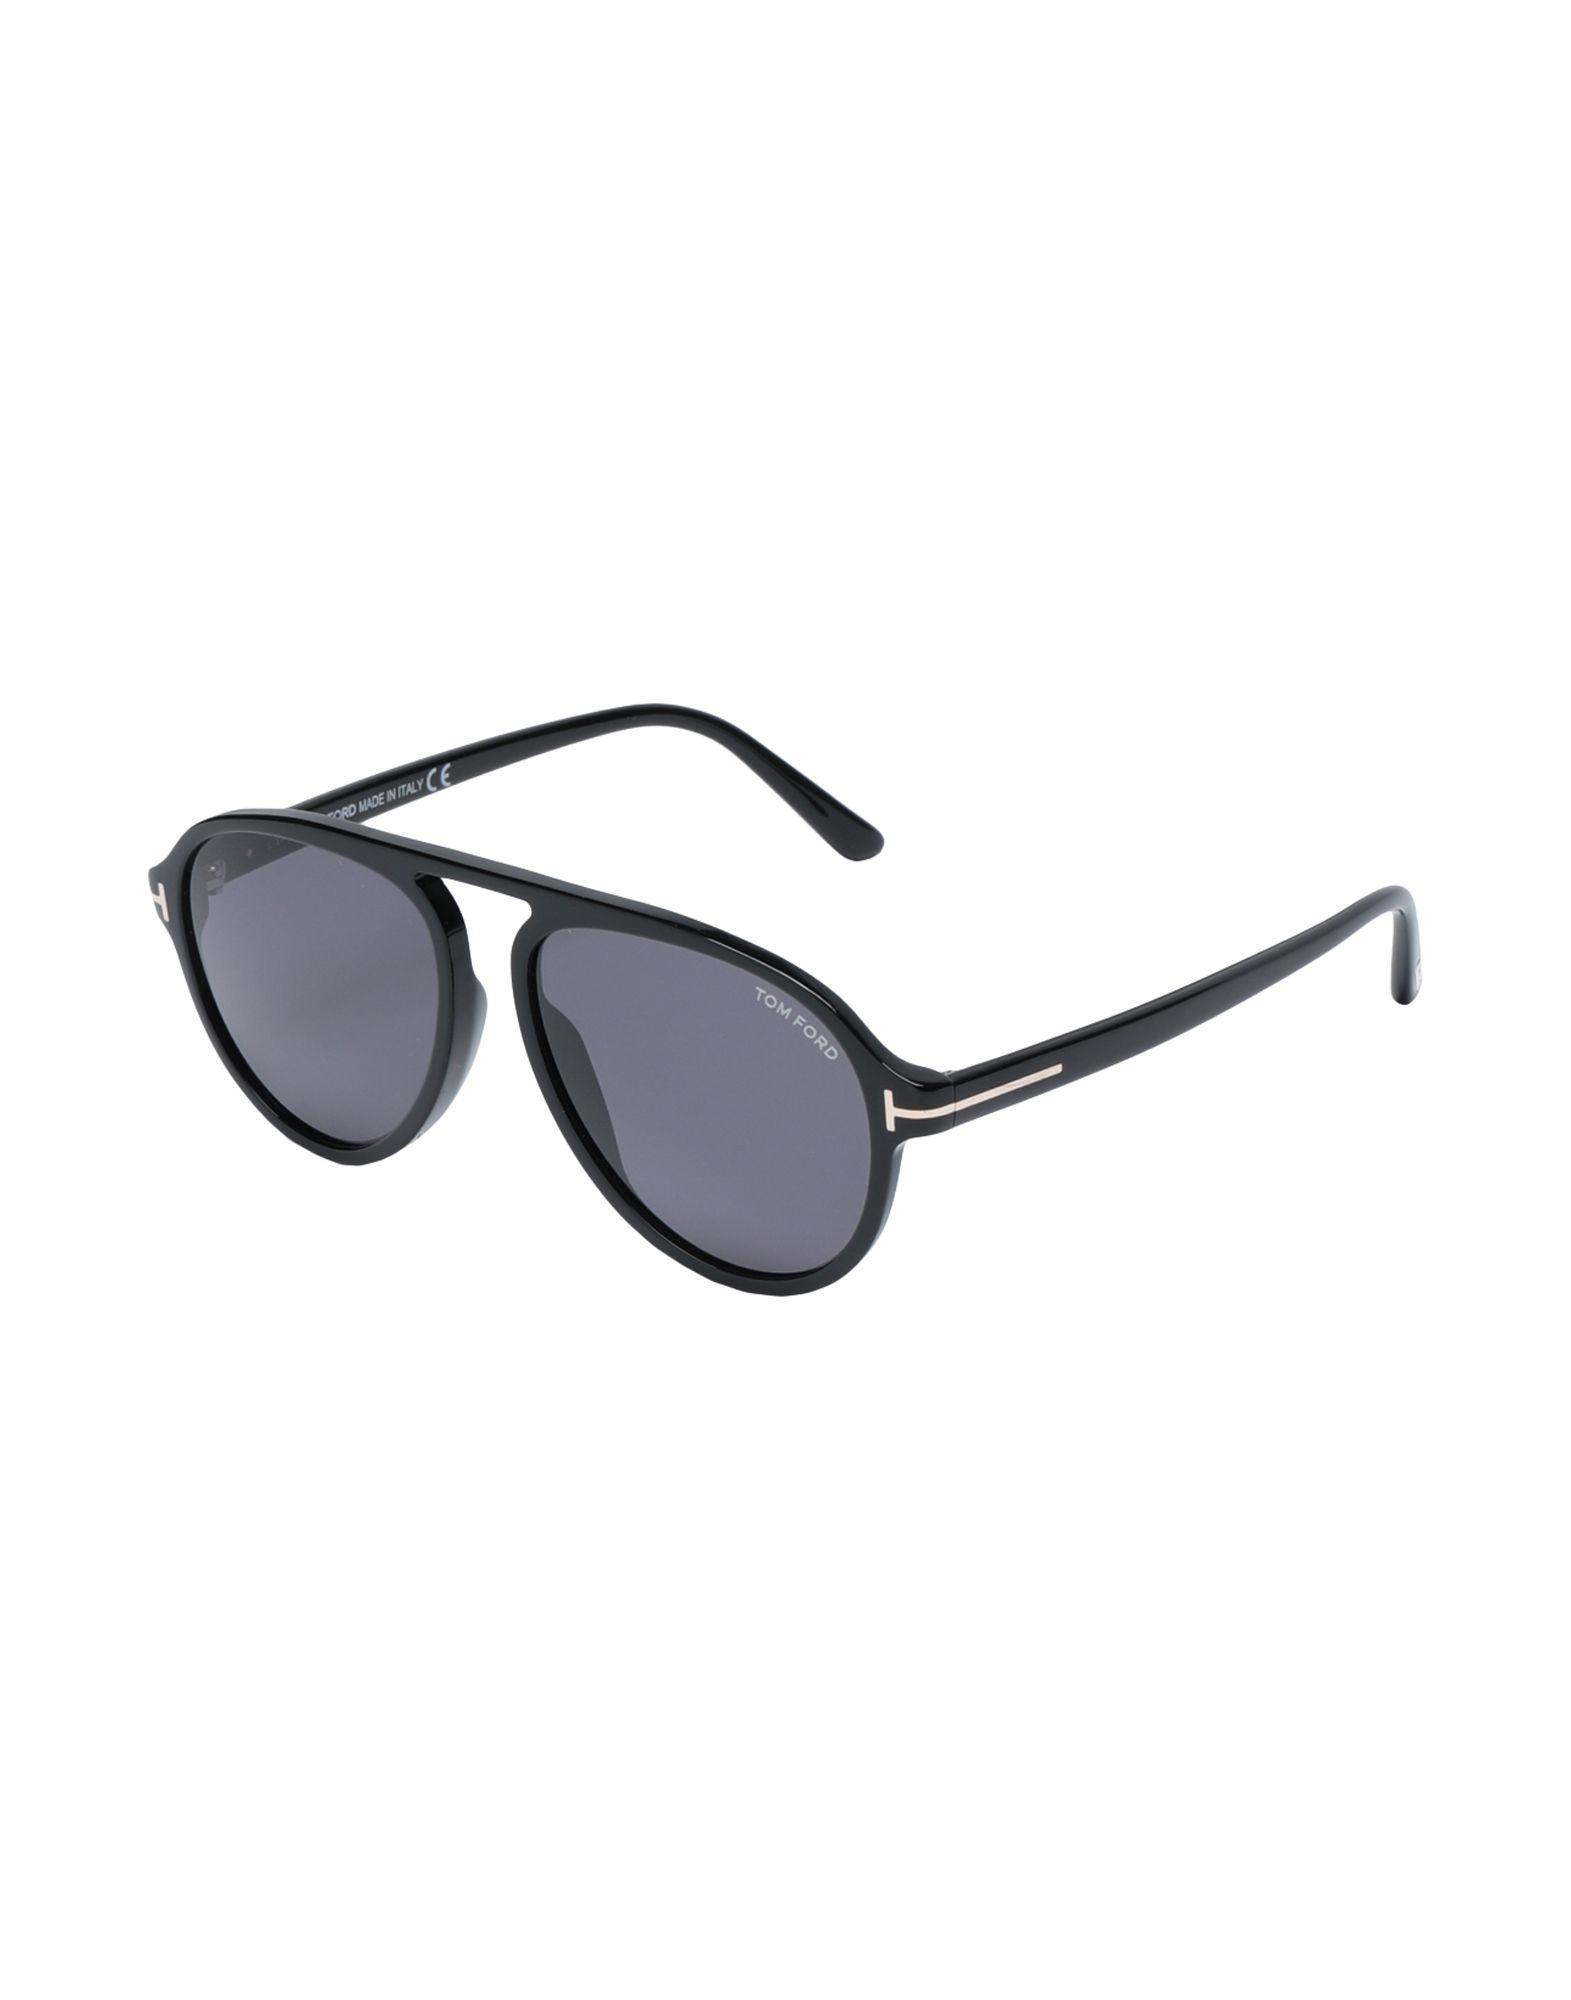 TOM FORD Sunglasses - Item 46699034